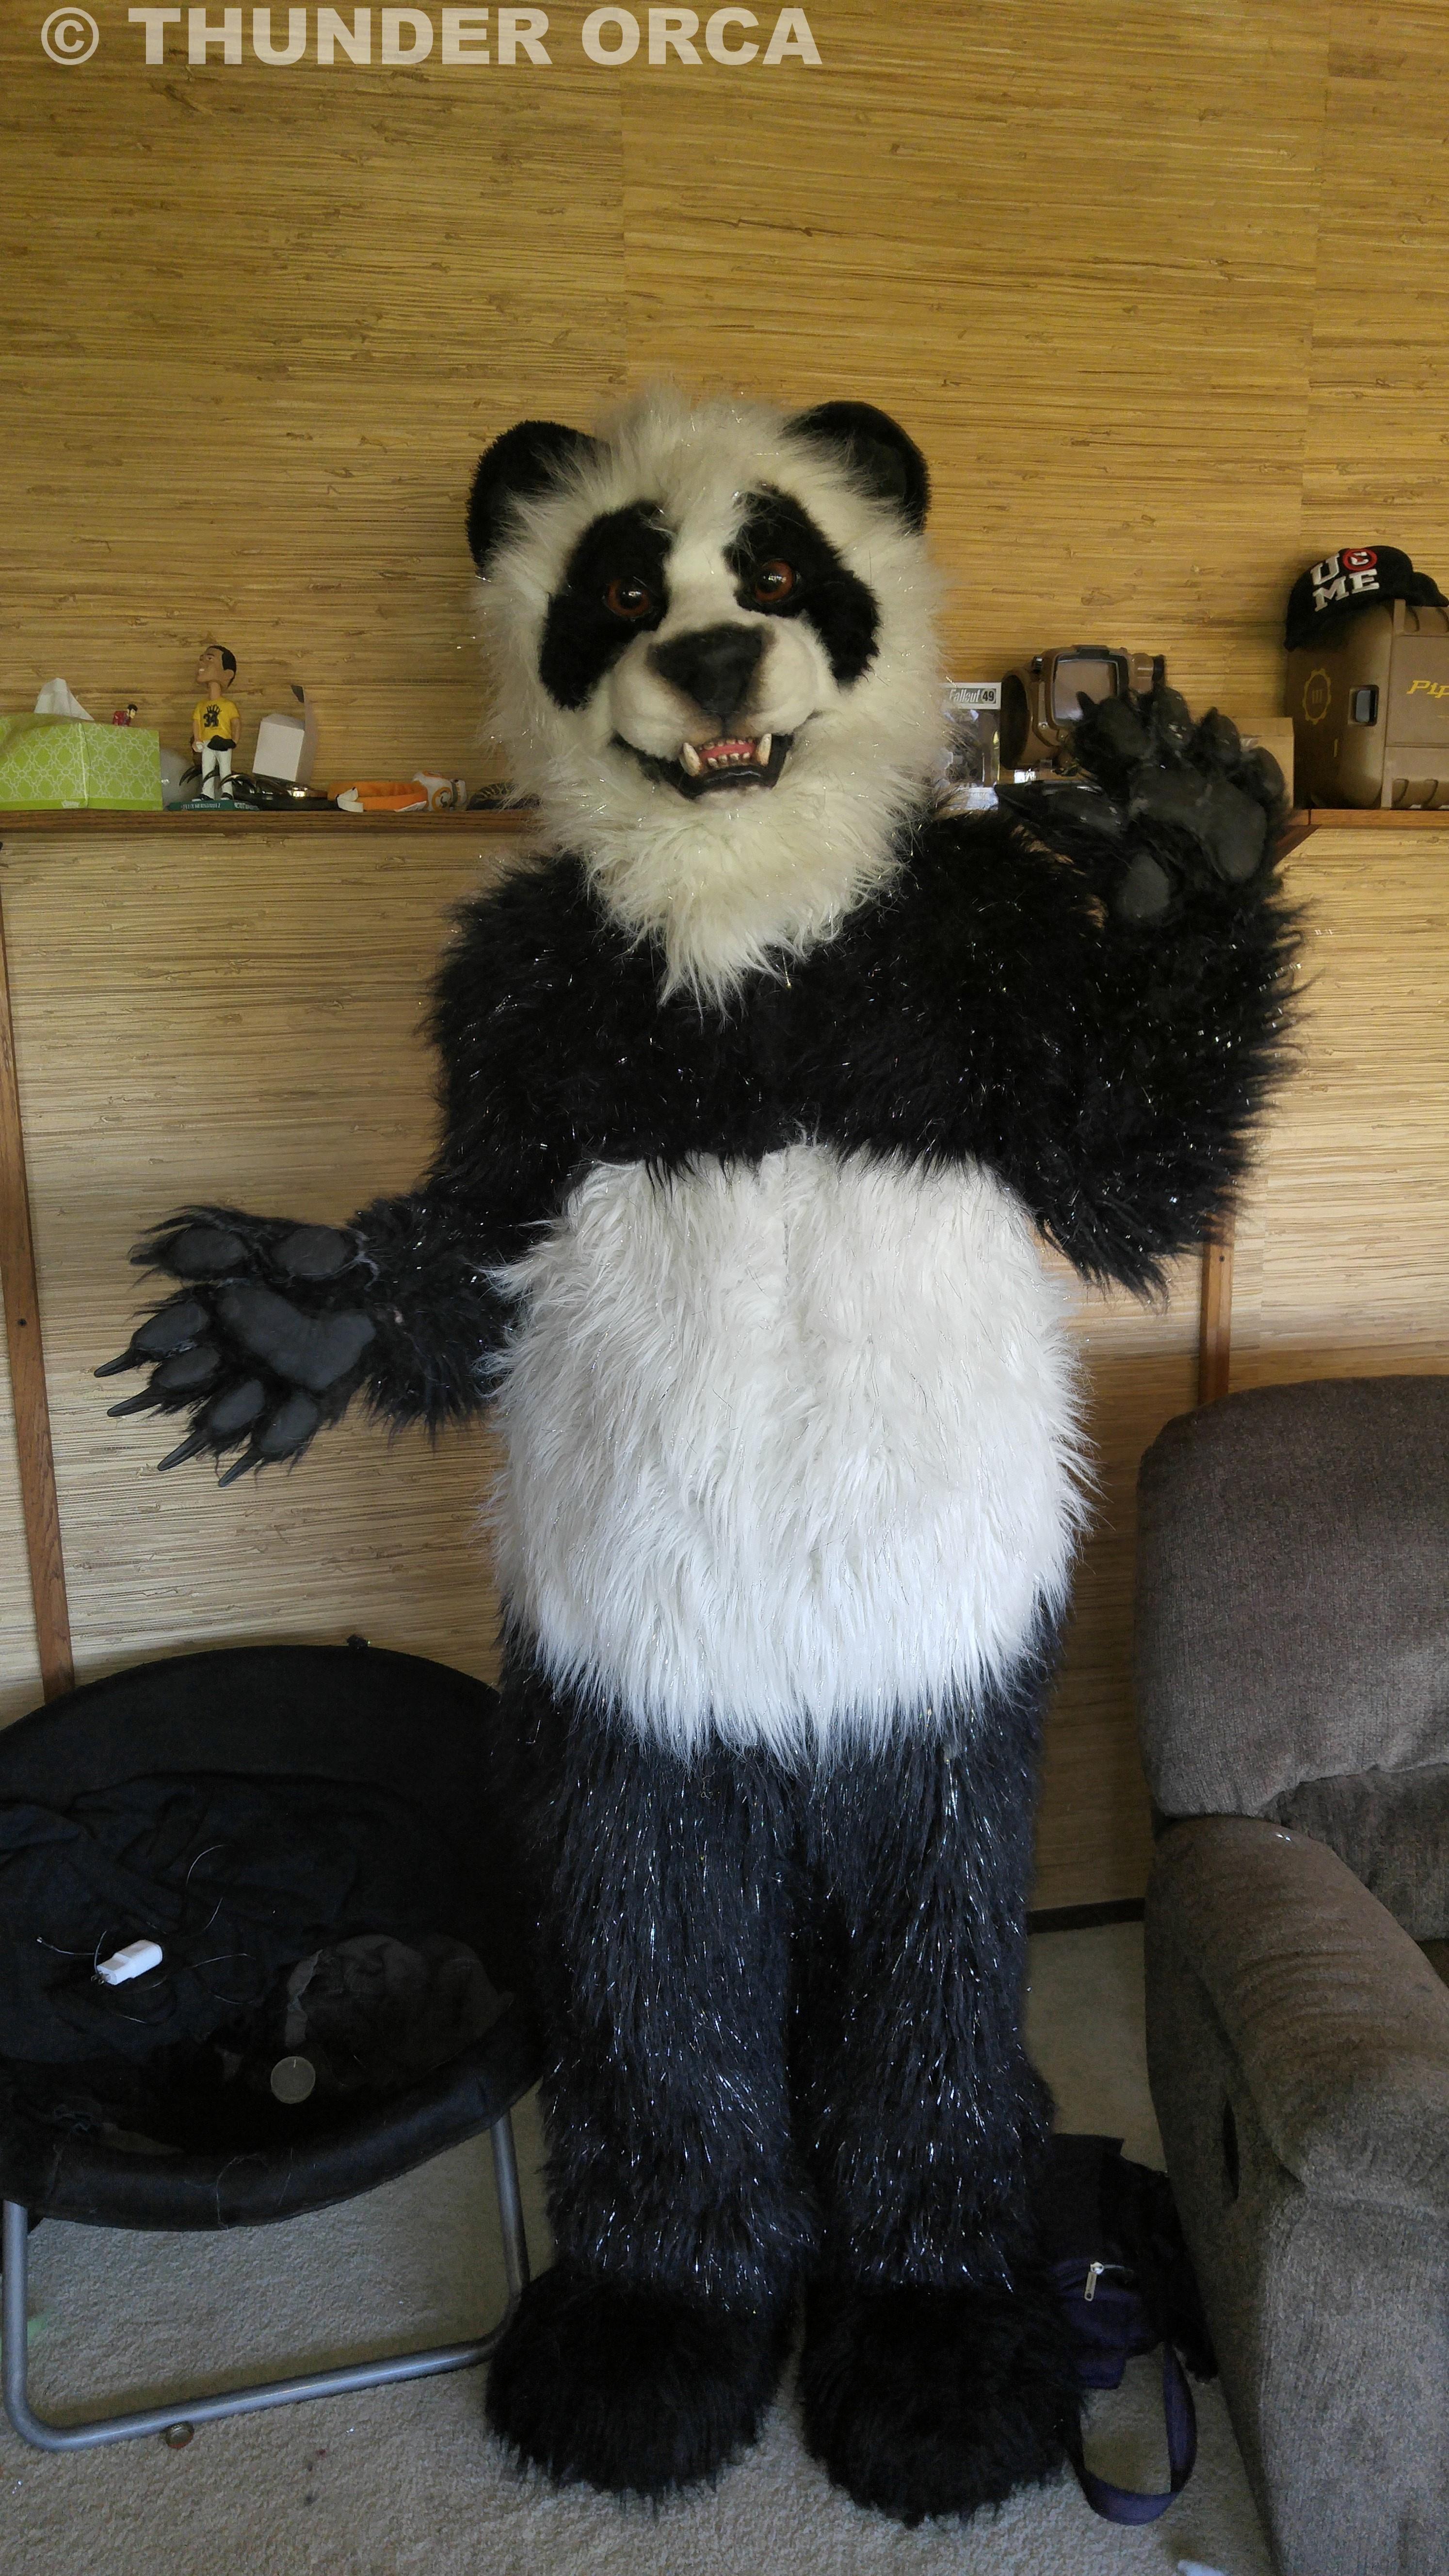 Fursuit Panda my panda fursuit. ^_^ (part 6) — weasyl